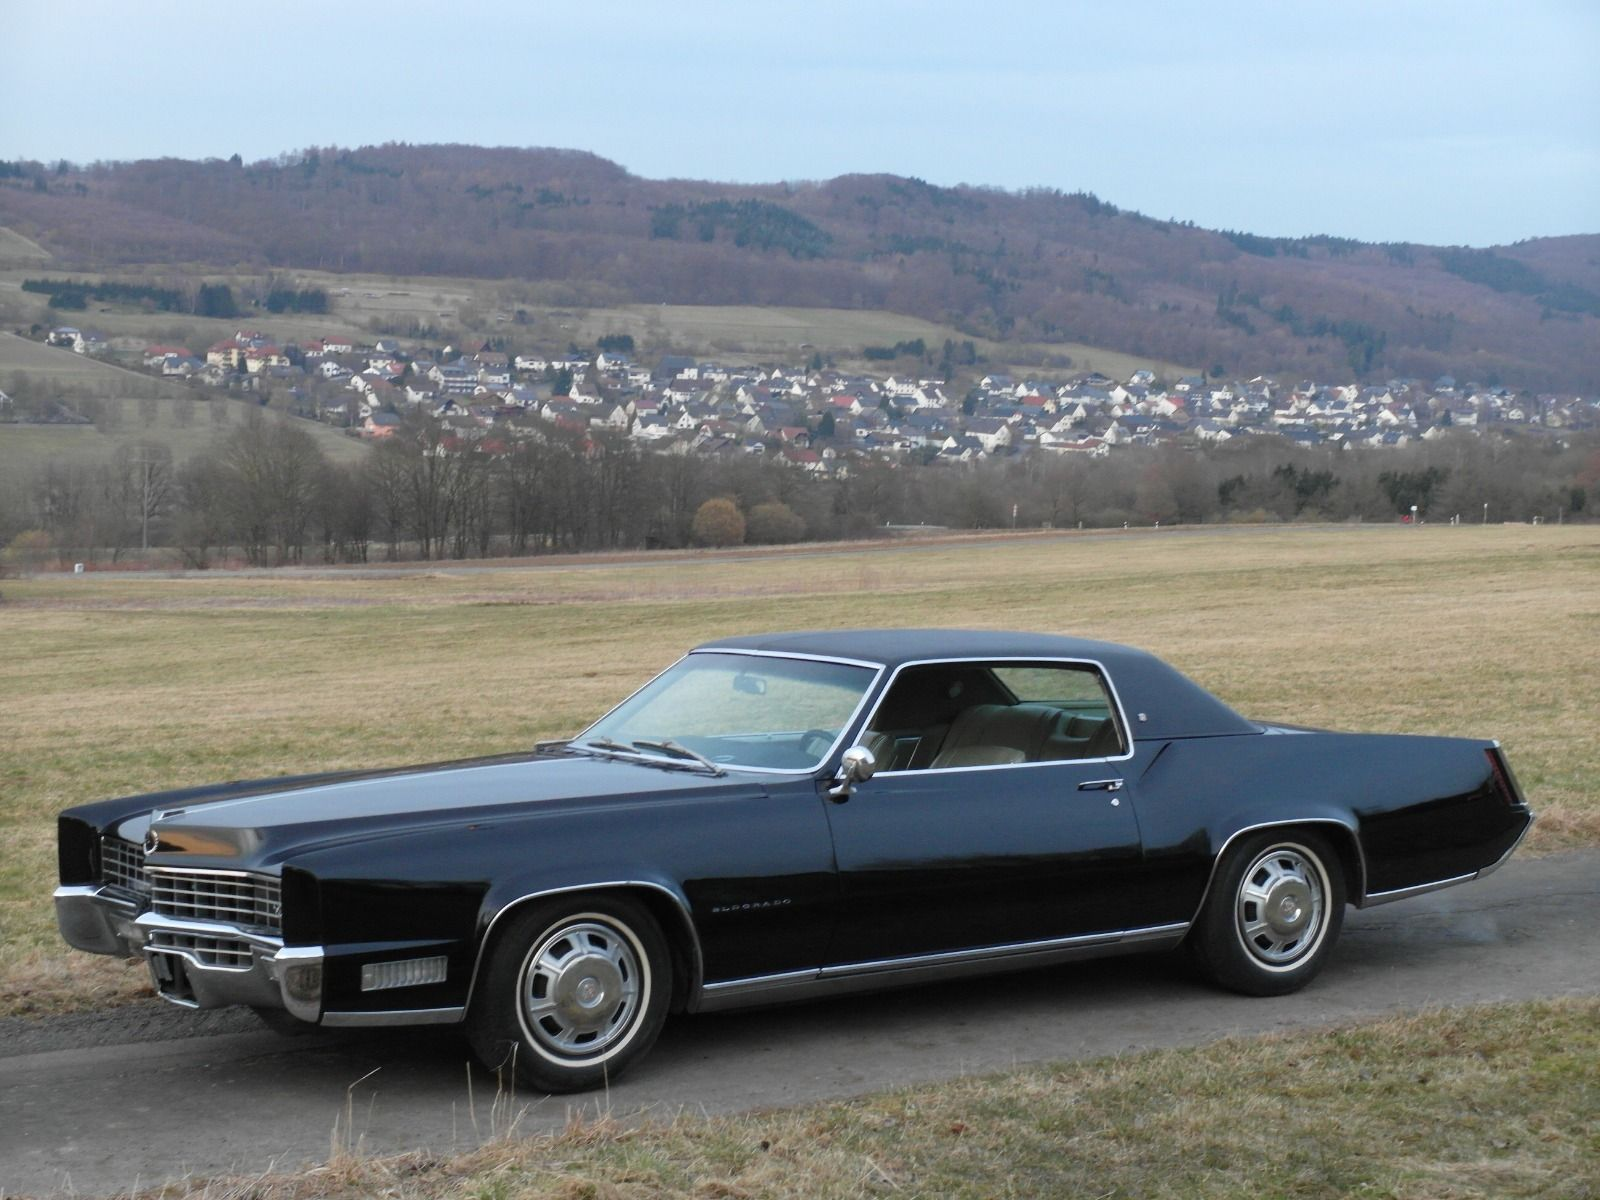 Cadillac Eldorado 1967 Fleetwood Pedal Cars Top 2017